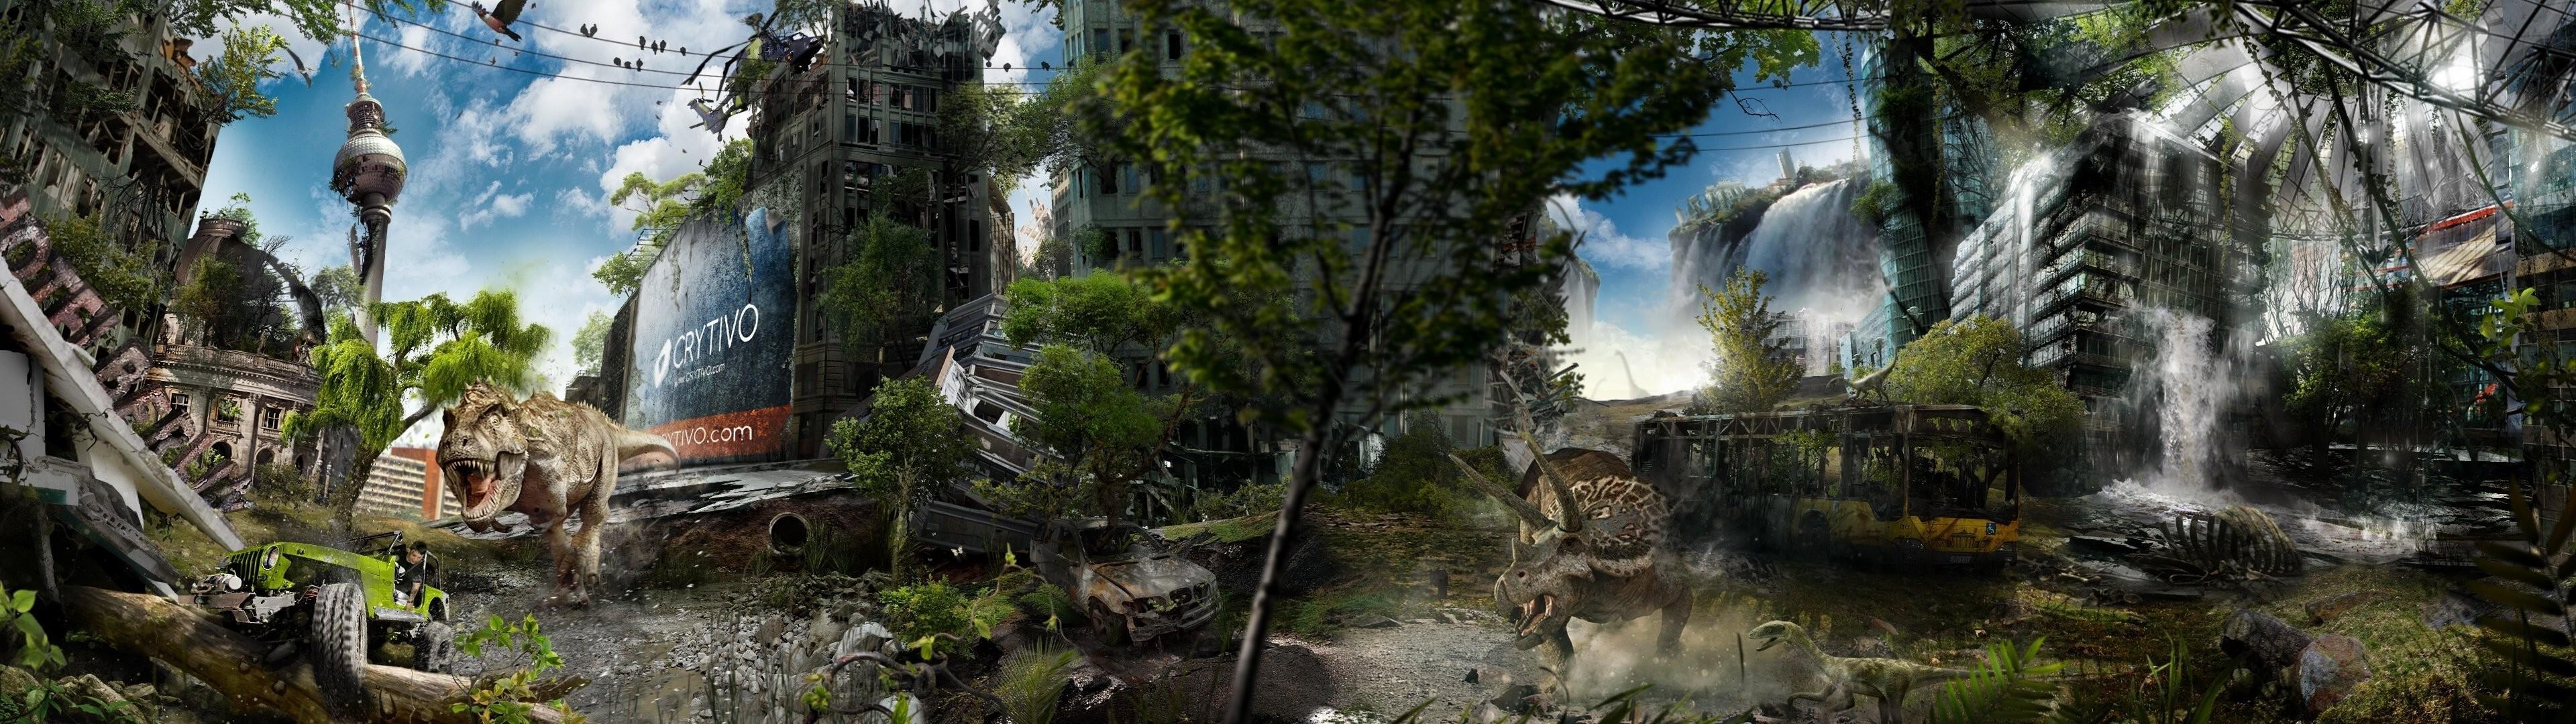 alexander koshelkov berlin post-apocalypse town ruin dinosaurs buildings dual  monitor